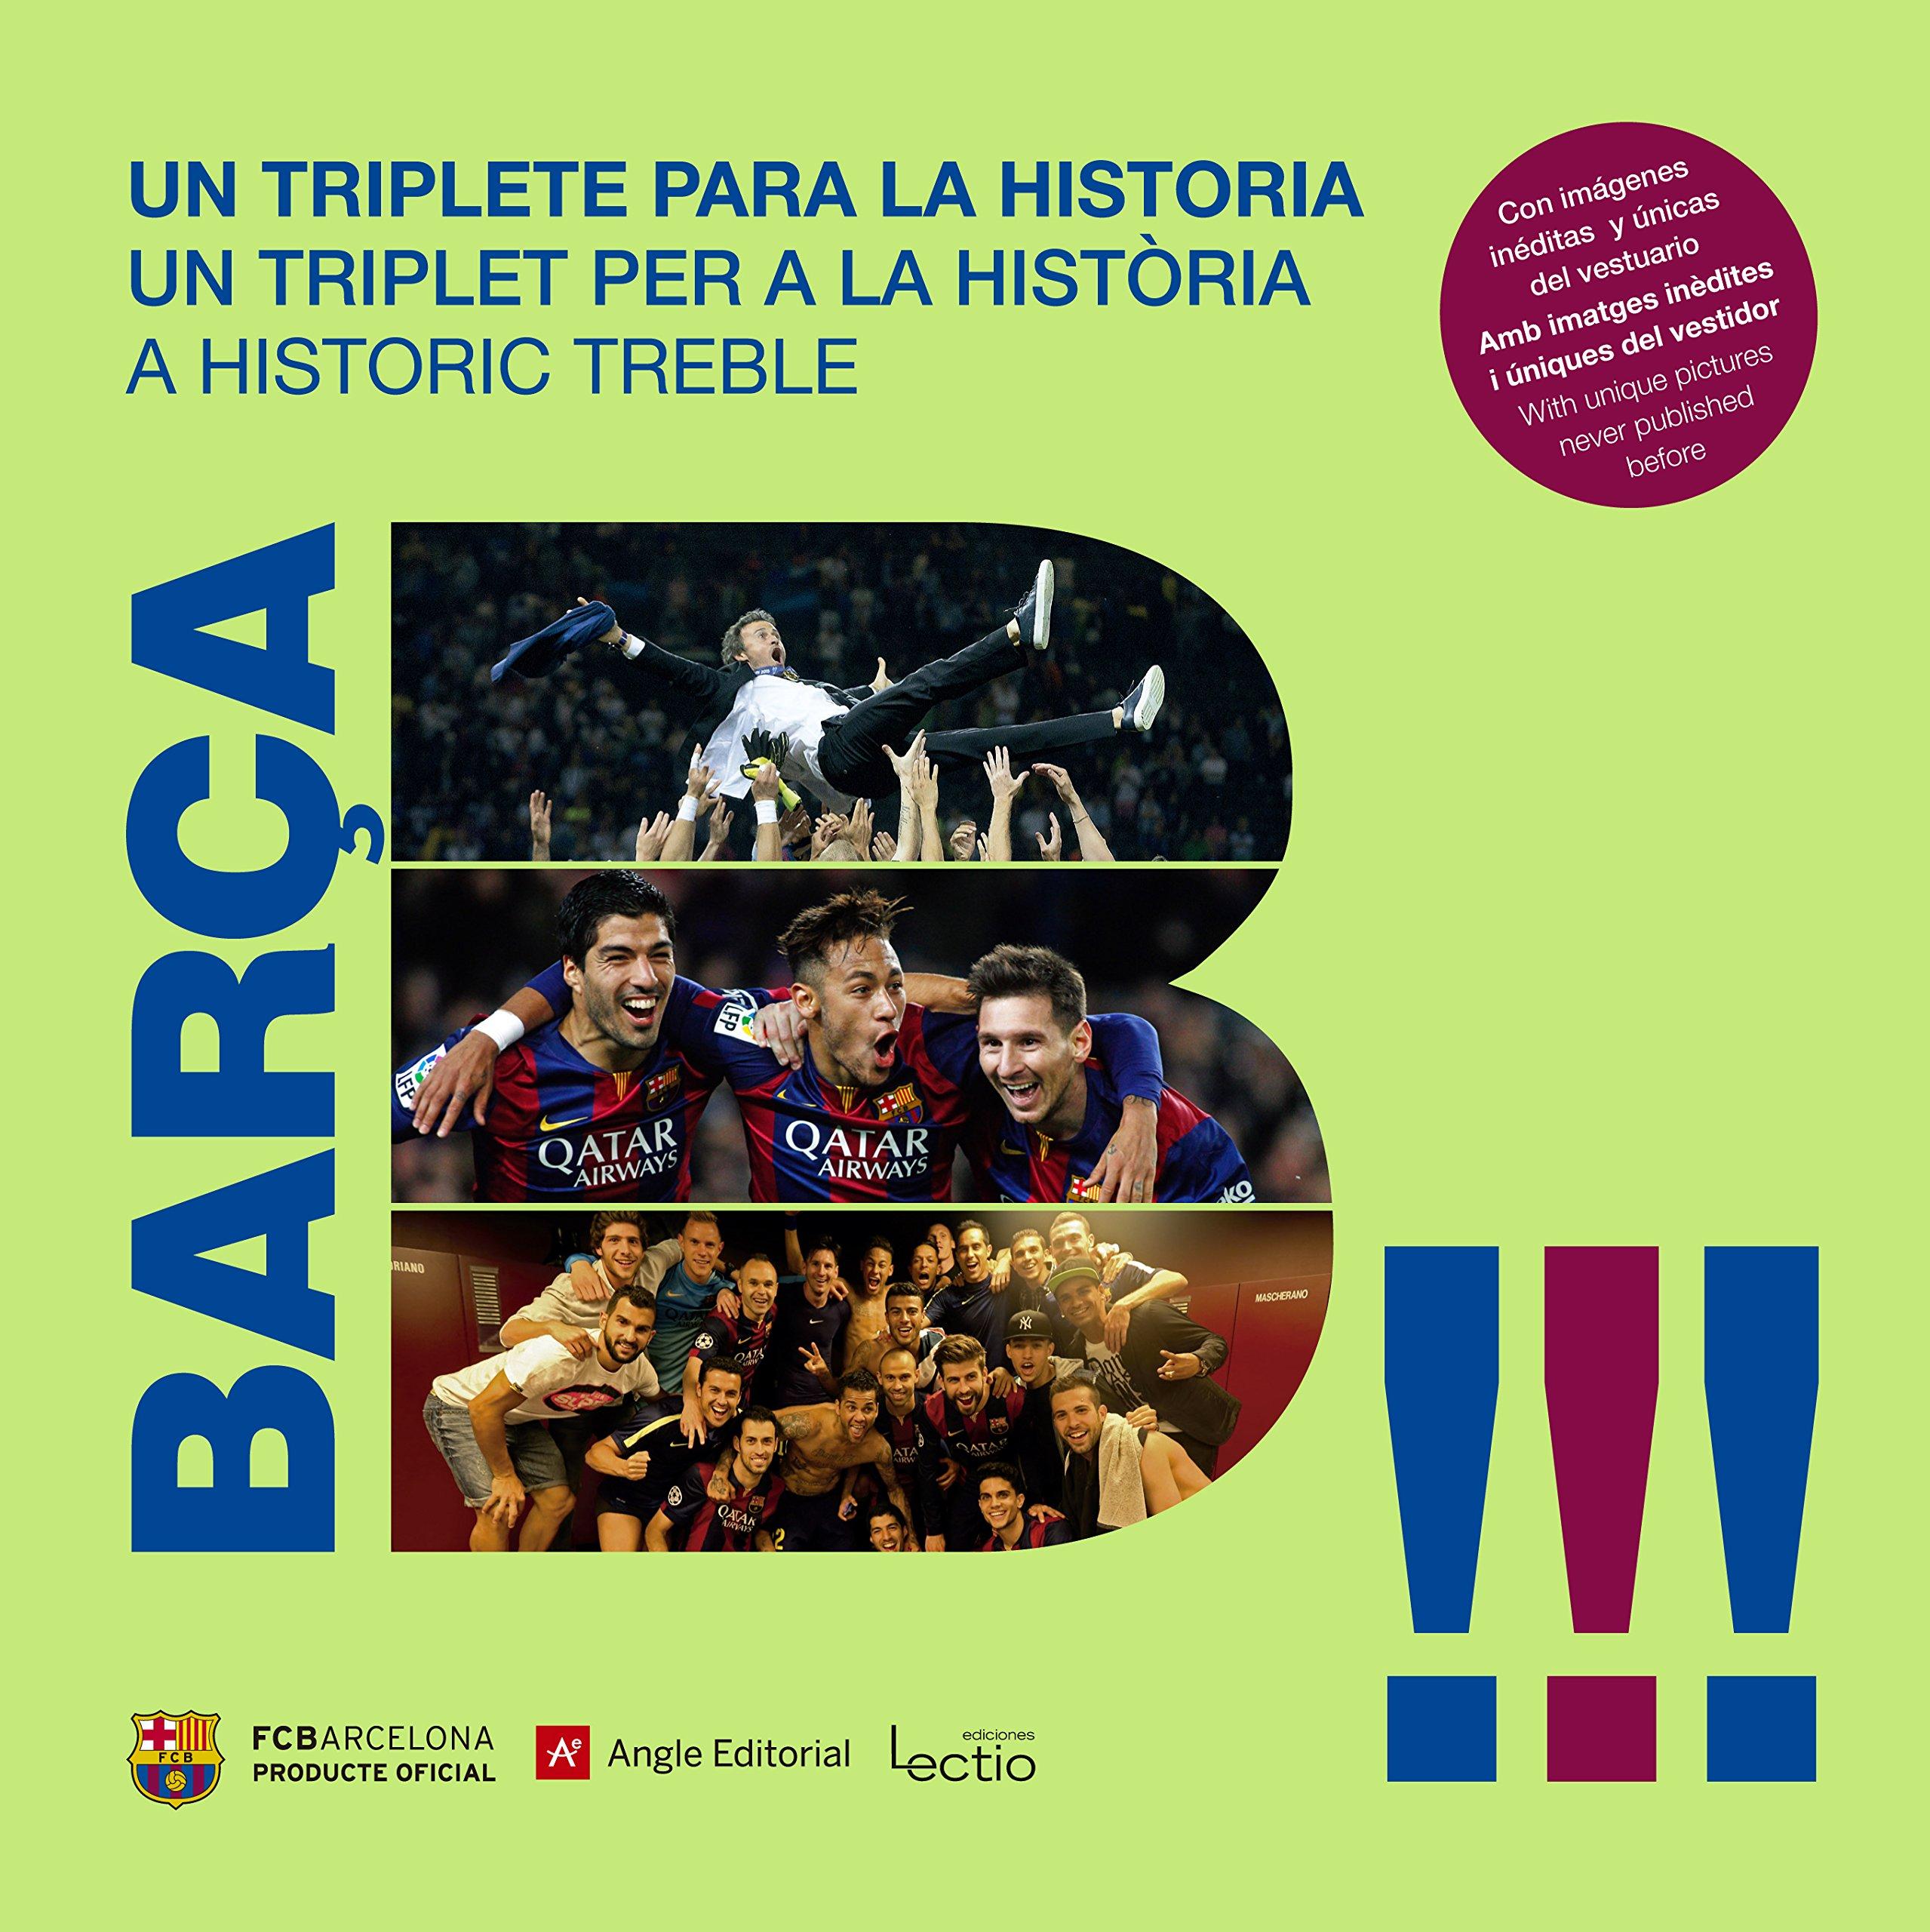 Barça. Un Triplete Para La Historia (Otros)  Amazon.es  Joan Josep Pallàs  Martí b3a9587b15b